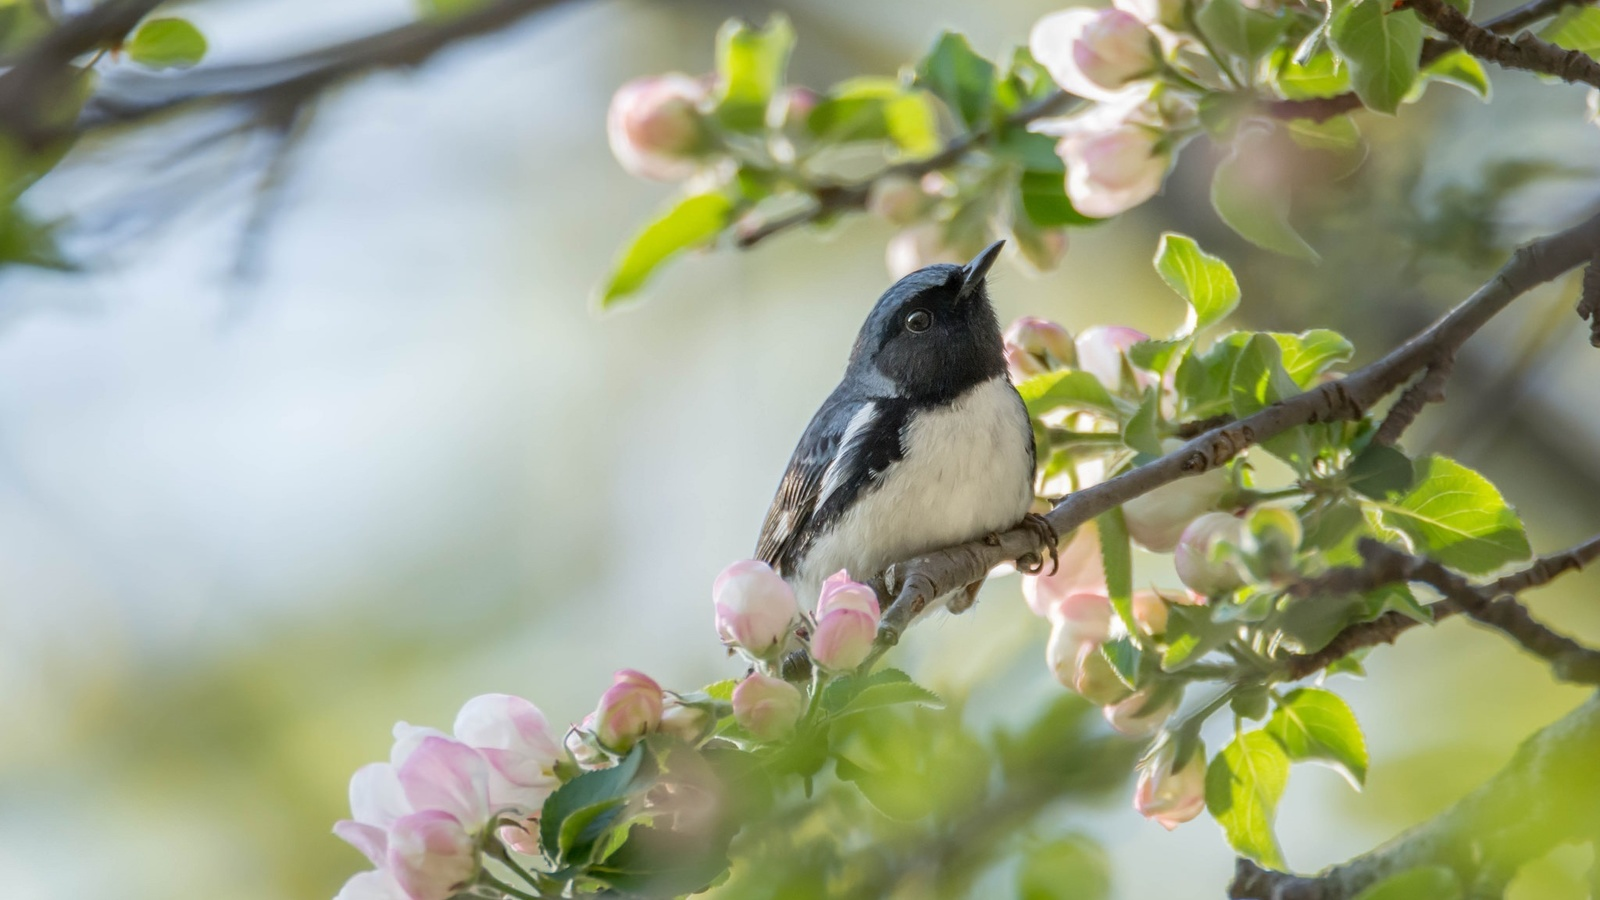 природа, весна, ветки, цветение, птица